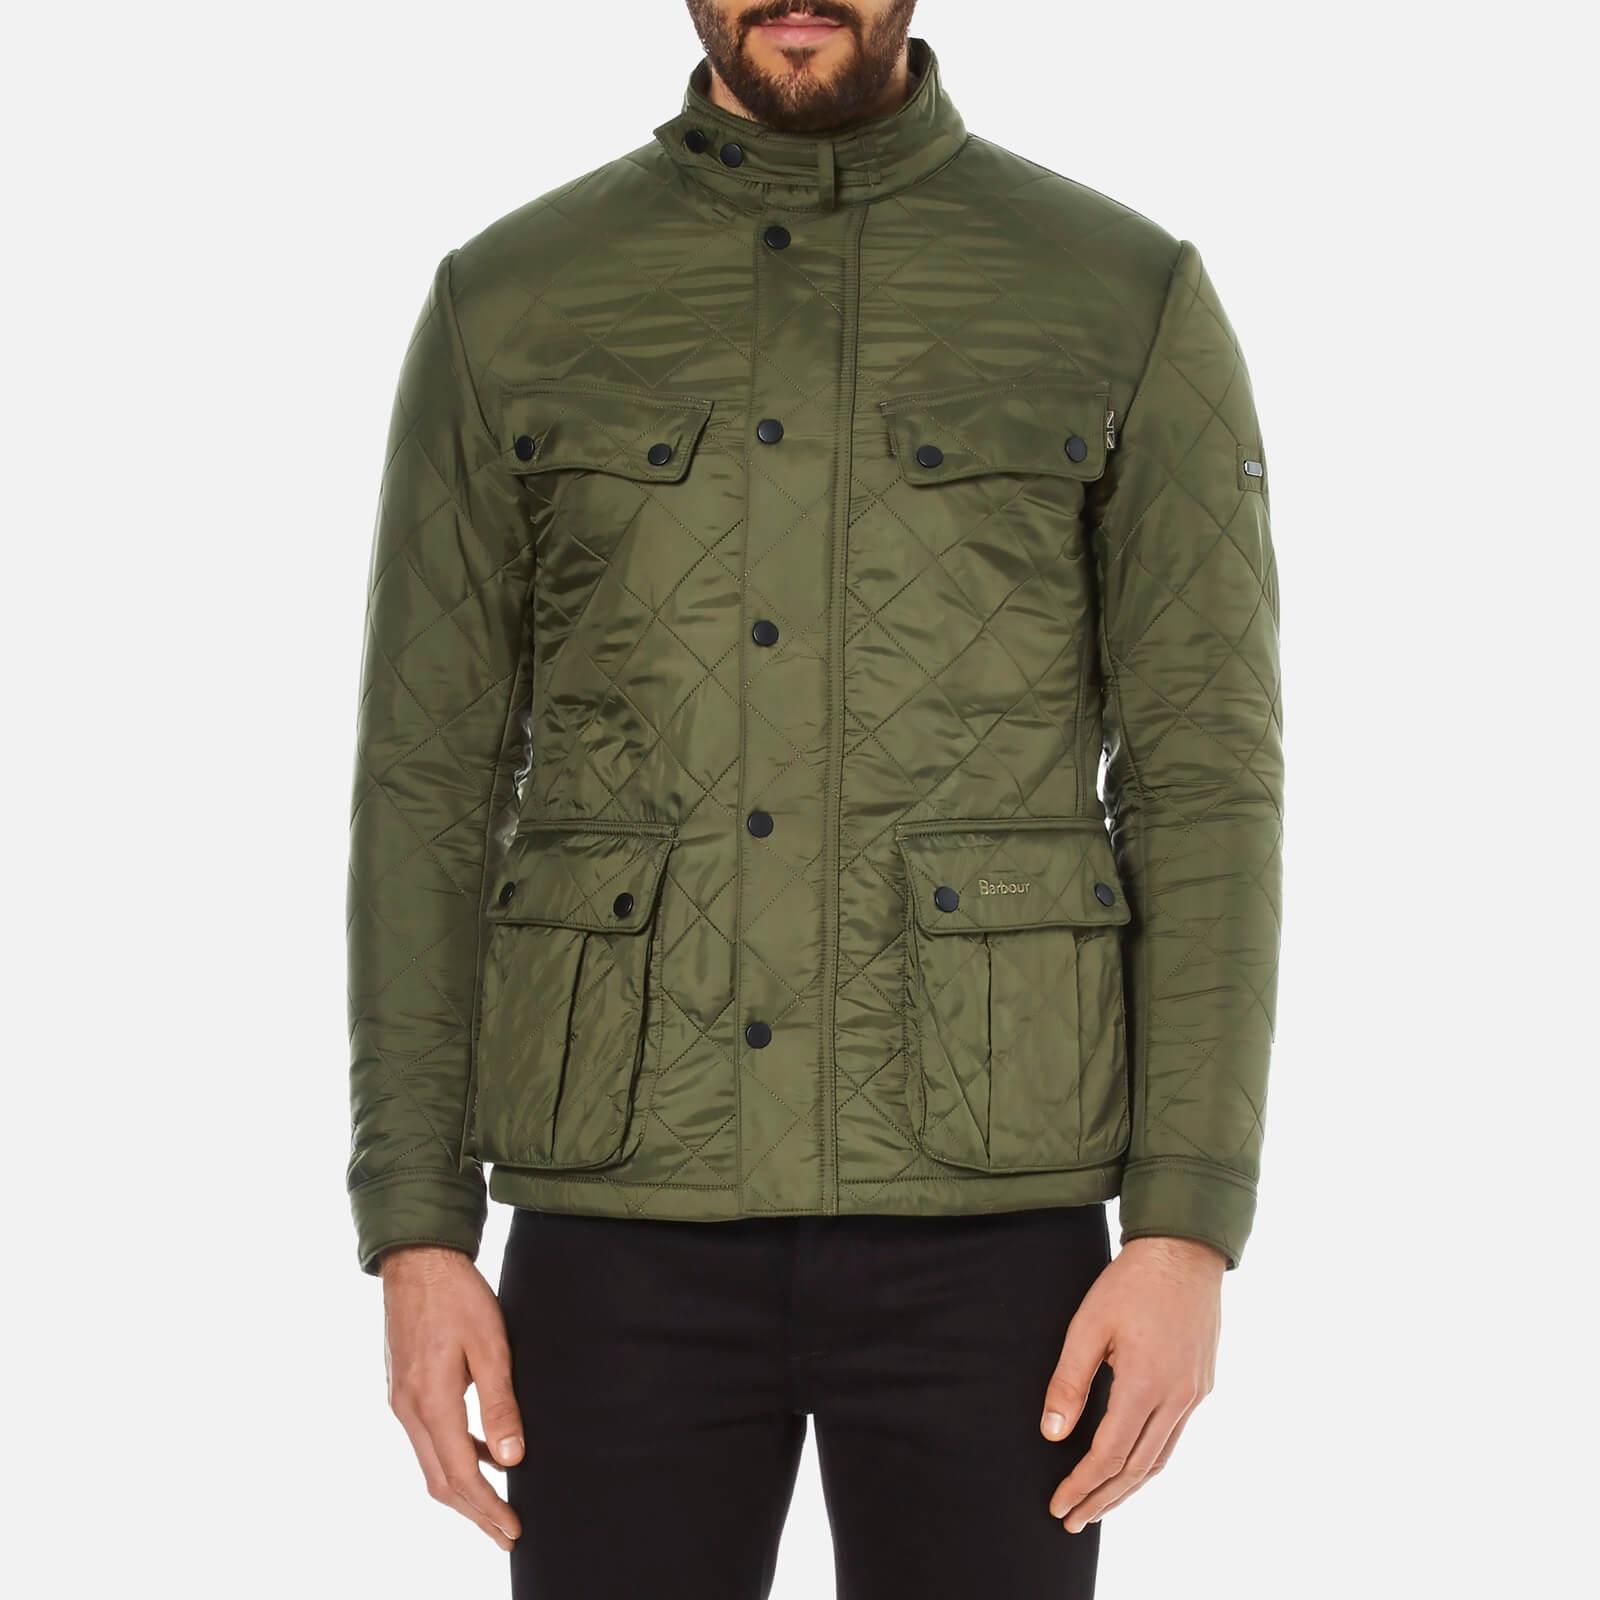 0b0526e93 Barbour International Men's Ariel Polarquilt Jacket - Olive